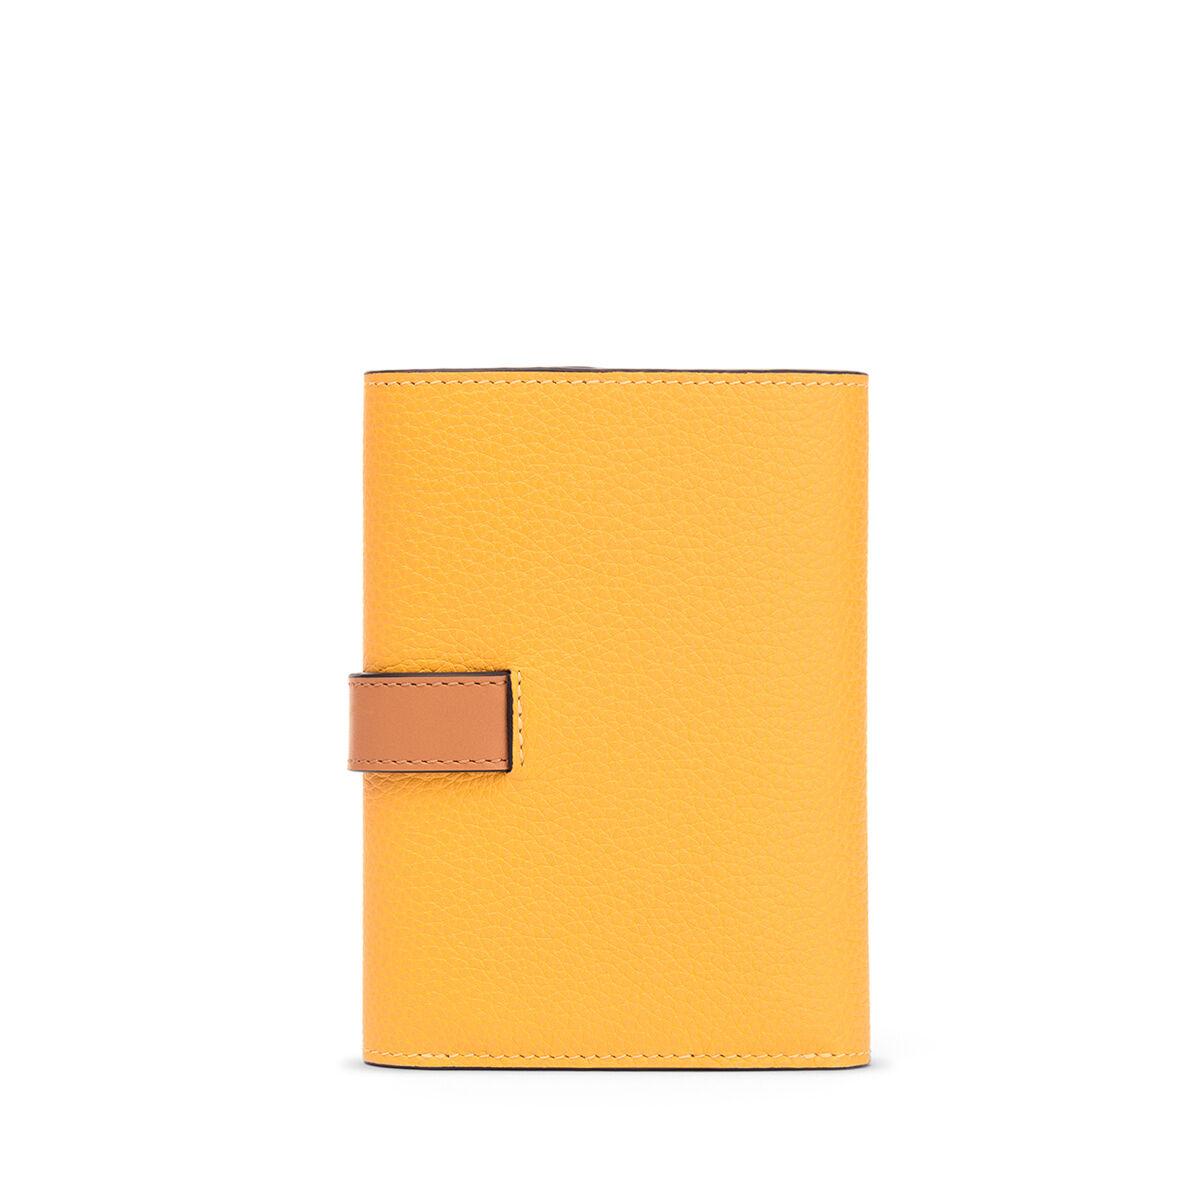 LOEWE Billetero Pequeño Vertical Amarillo Mango/Miel all